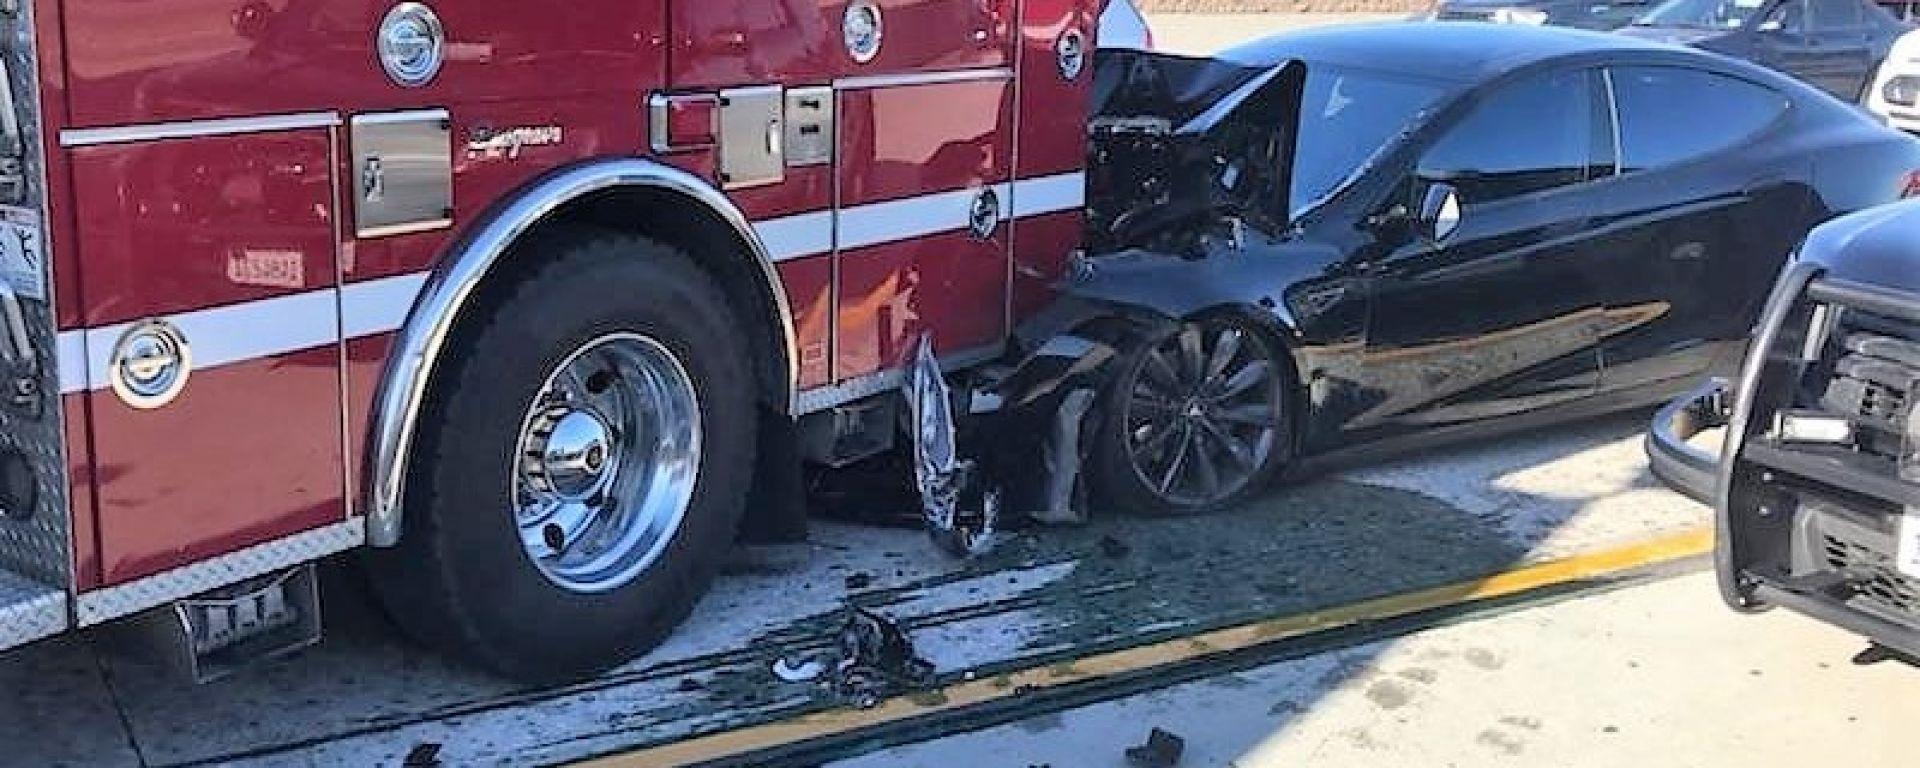 Tesla Model S: incidente con Autopilot attivo